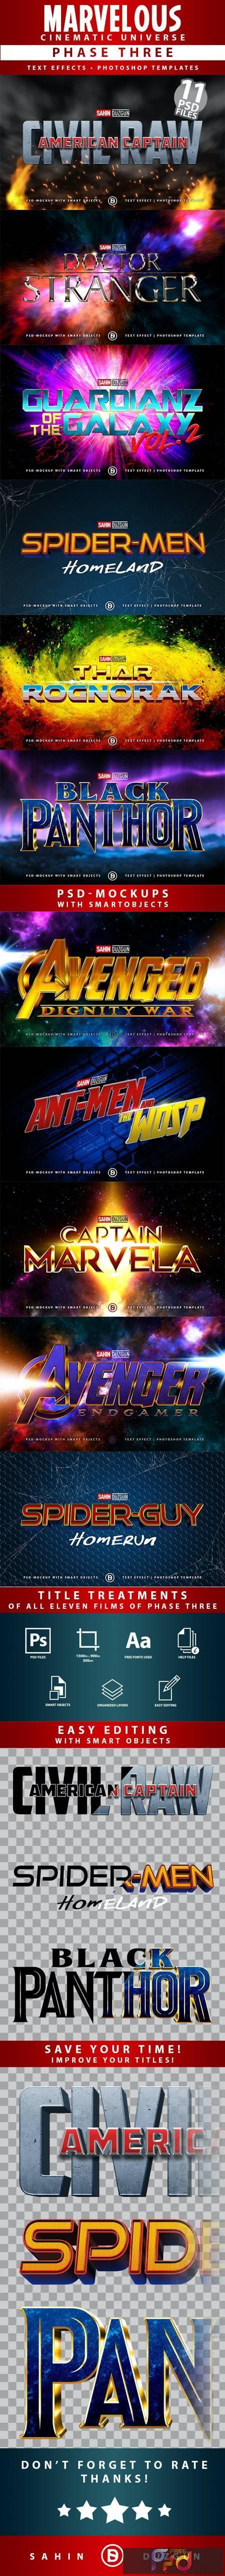 Marvelous Cinematic Universe - Phase Three 26501541 1